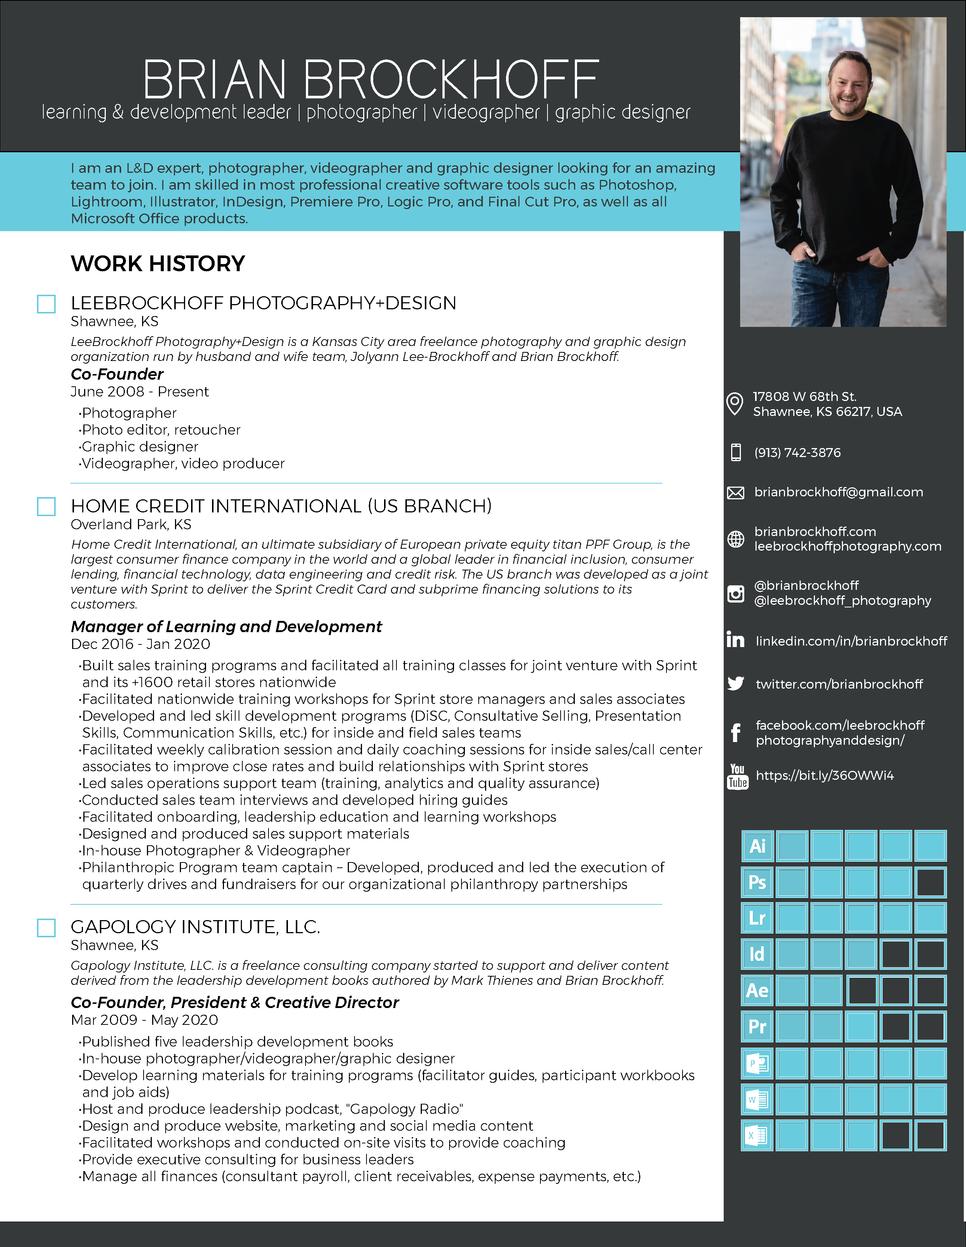 2020_BrianBrockhoff_Resume_0526-PH_PH1.p